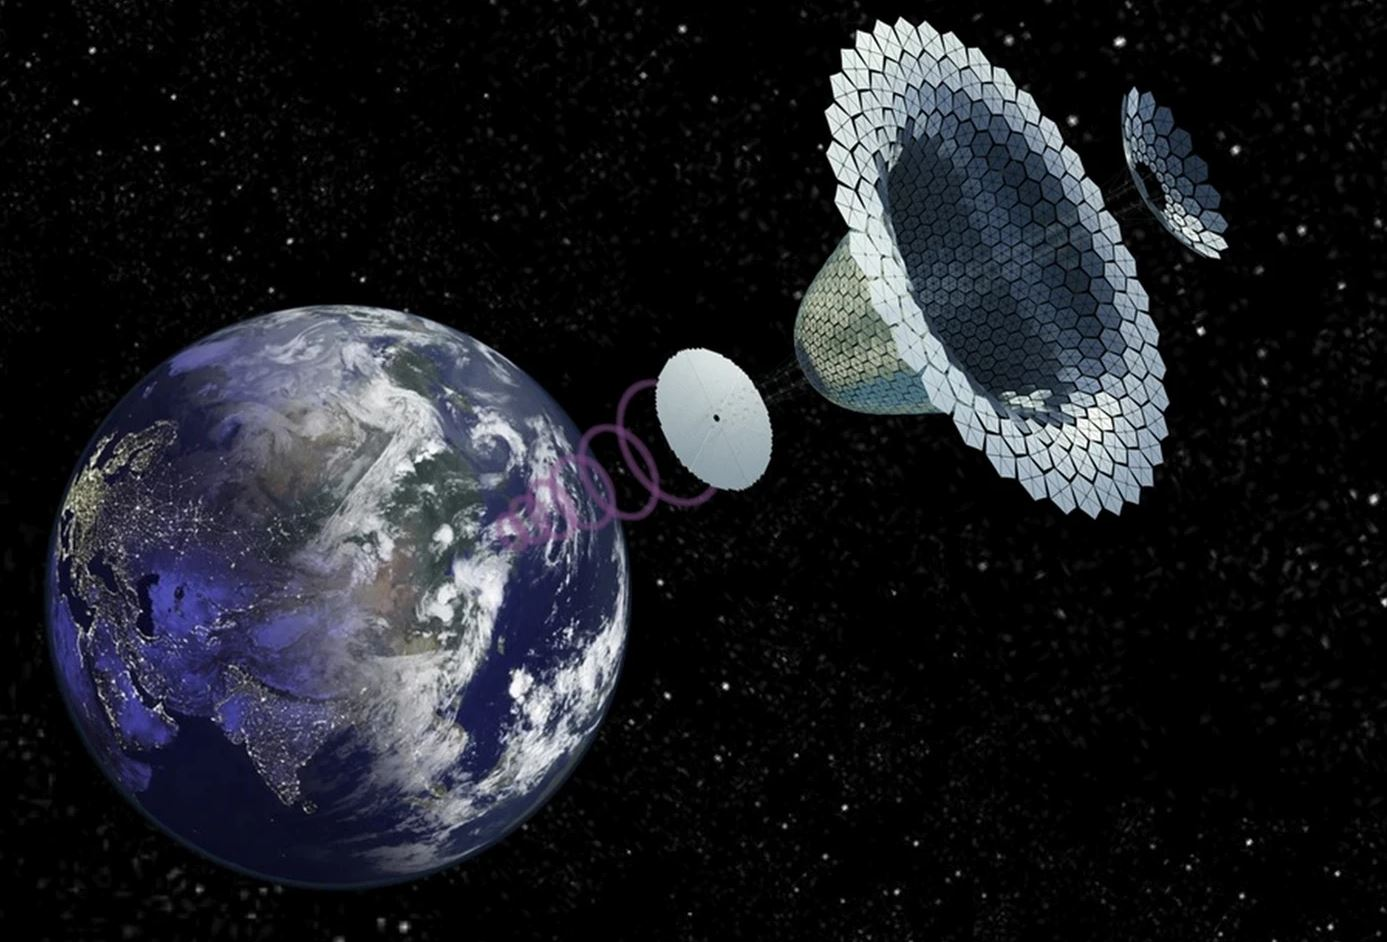 Image Credit:  NASA SPS-ALPHA concept by John C. Mankins